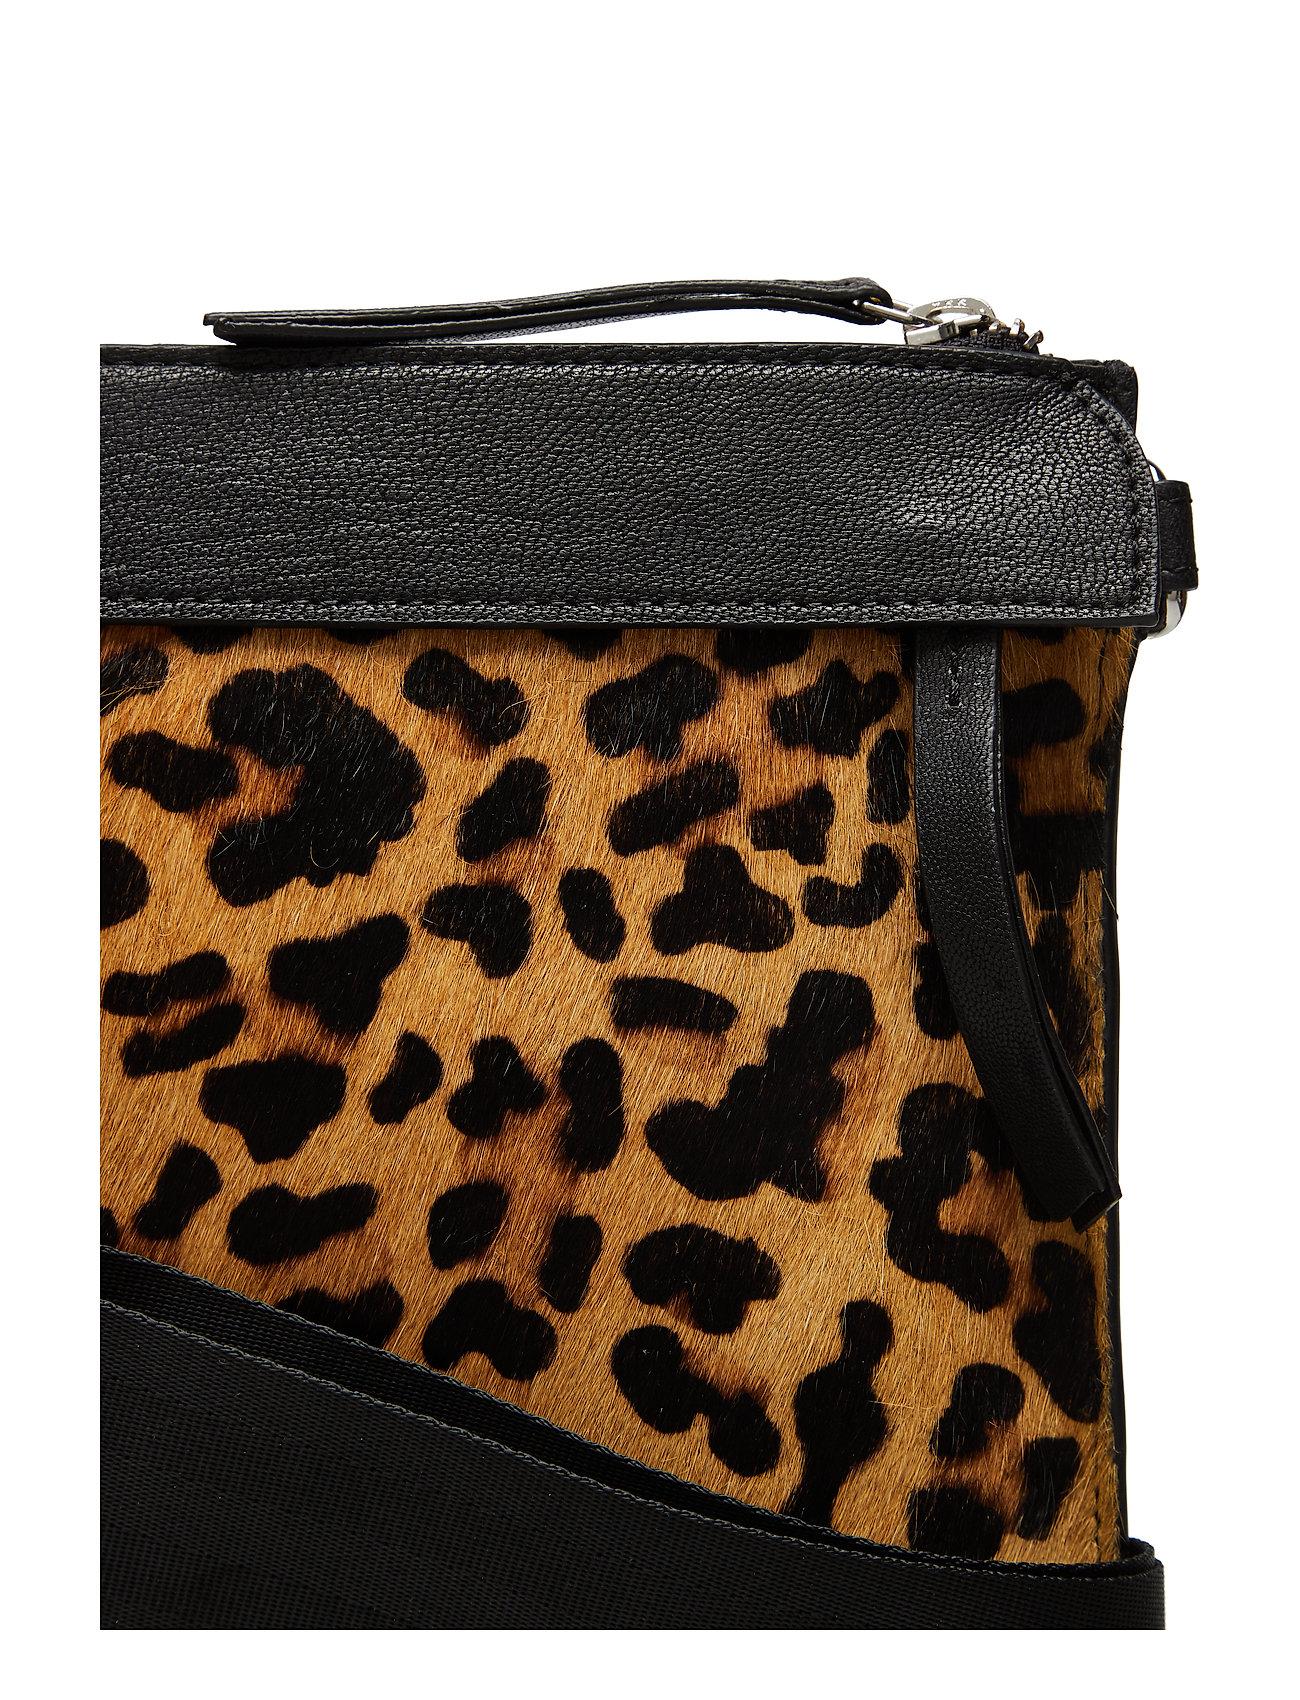 Amalfi Amalfi Bag CelinaleopardAdax Amalfi Bag Bag CelinaleopardAdax Shoulder Amalfi Shoulder CelinaleopardAdax Shoulder Shoulder 54jqR3AL